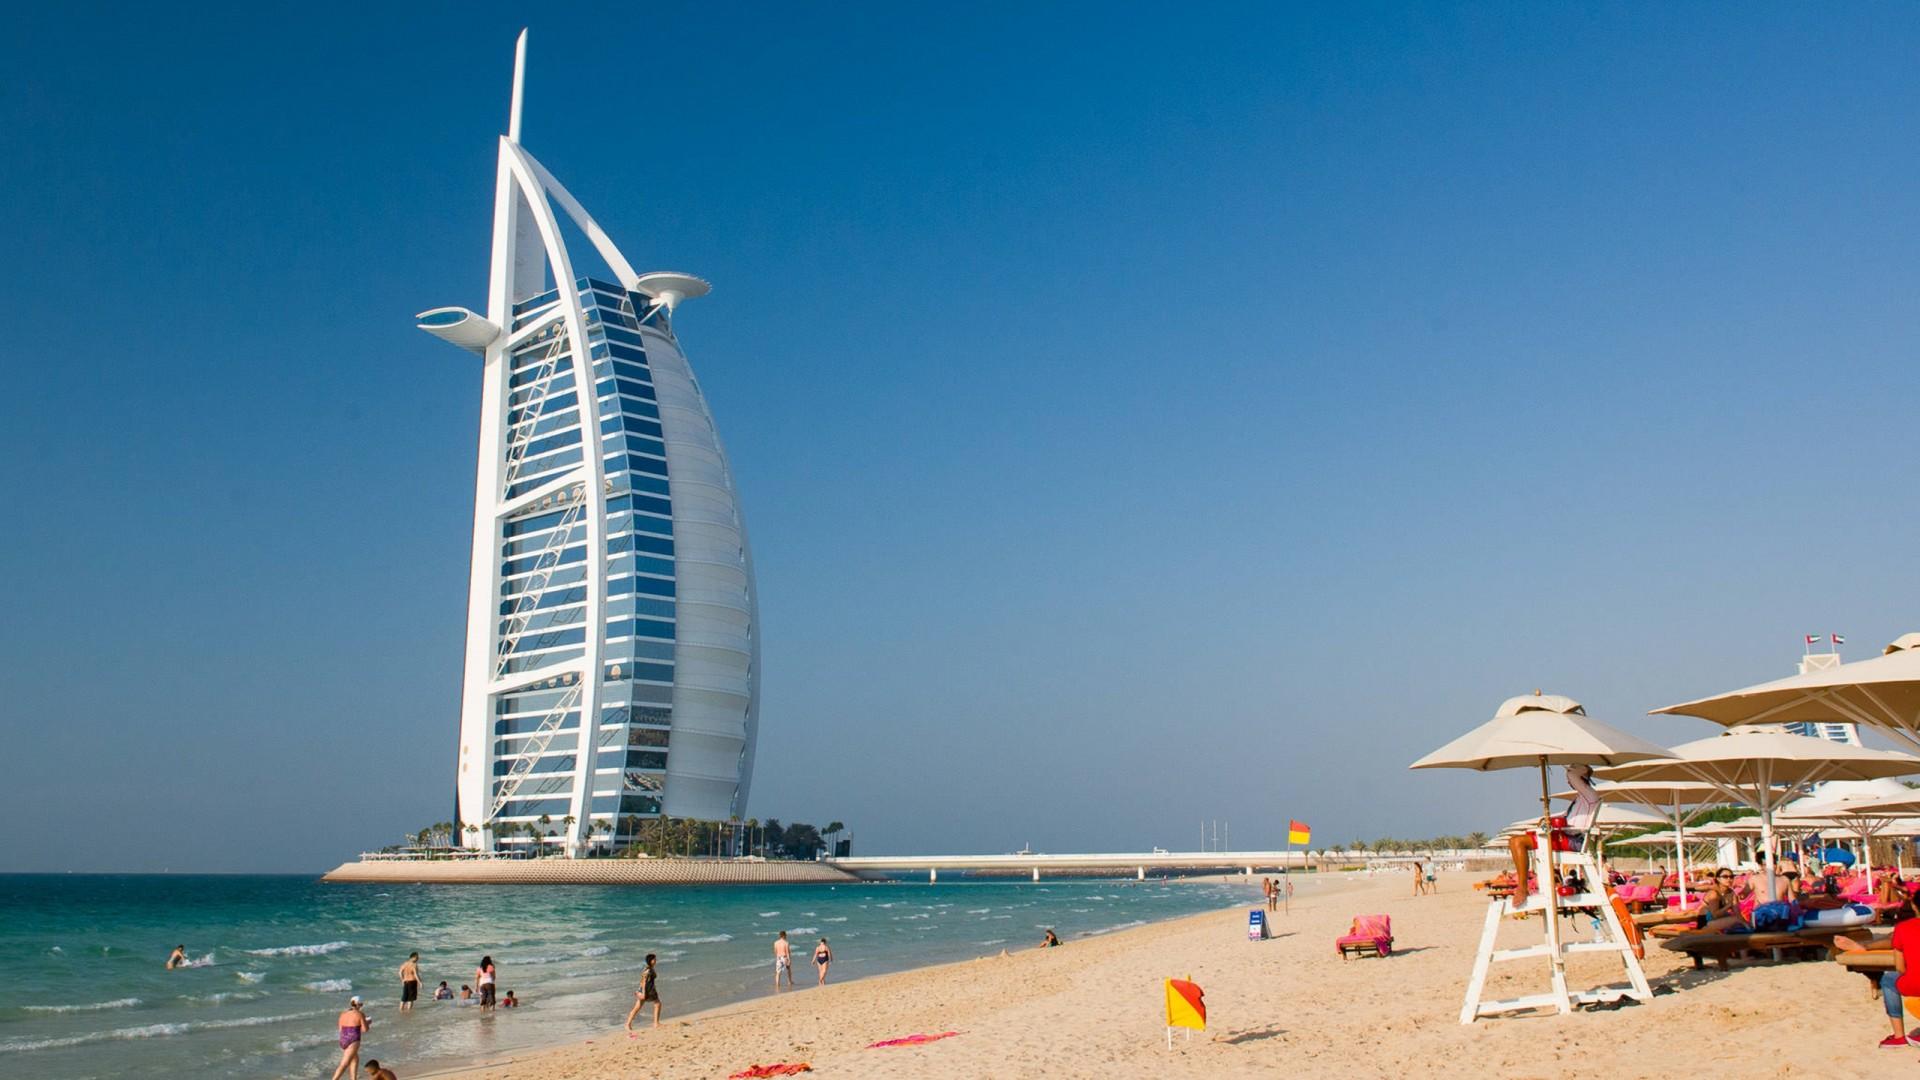 burj-al-arab-hotel-dubai-8205836136-1920x1080.jpg